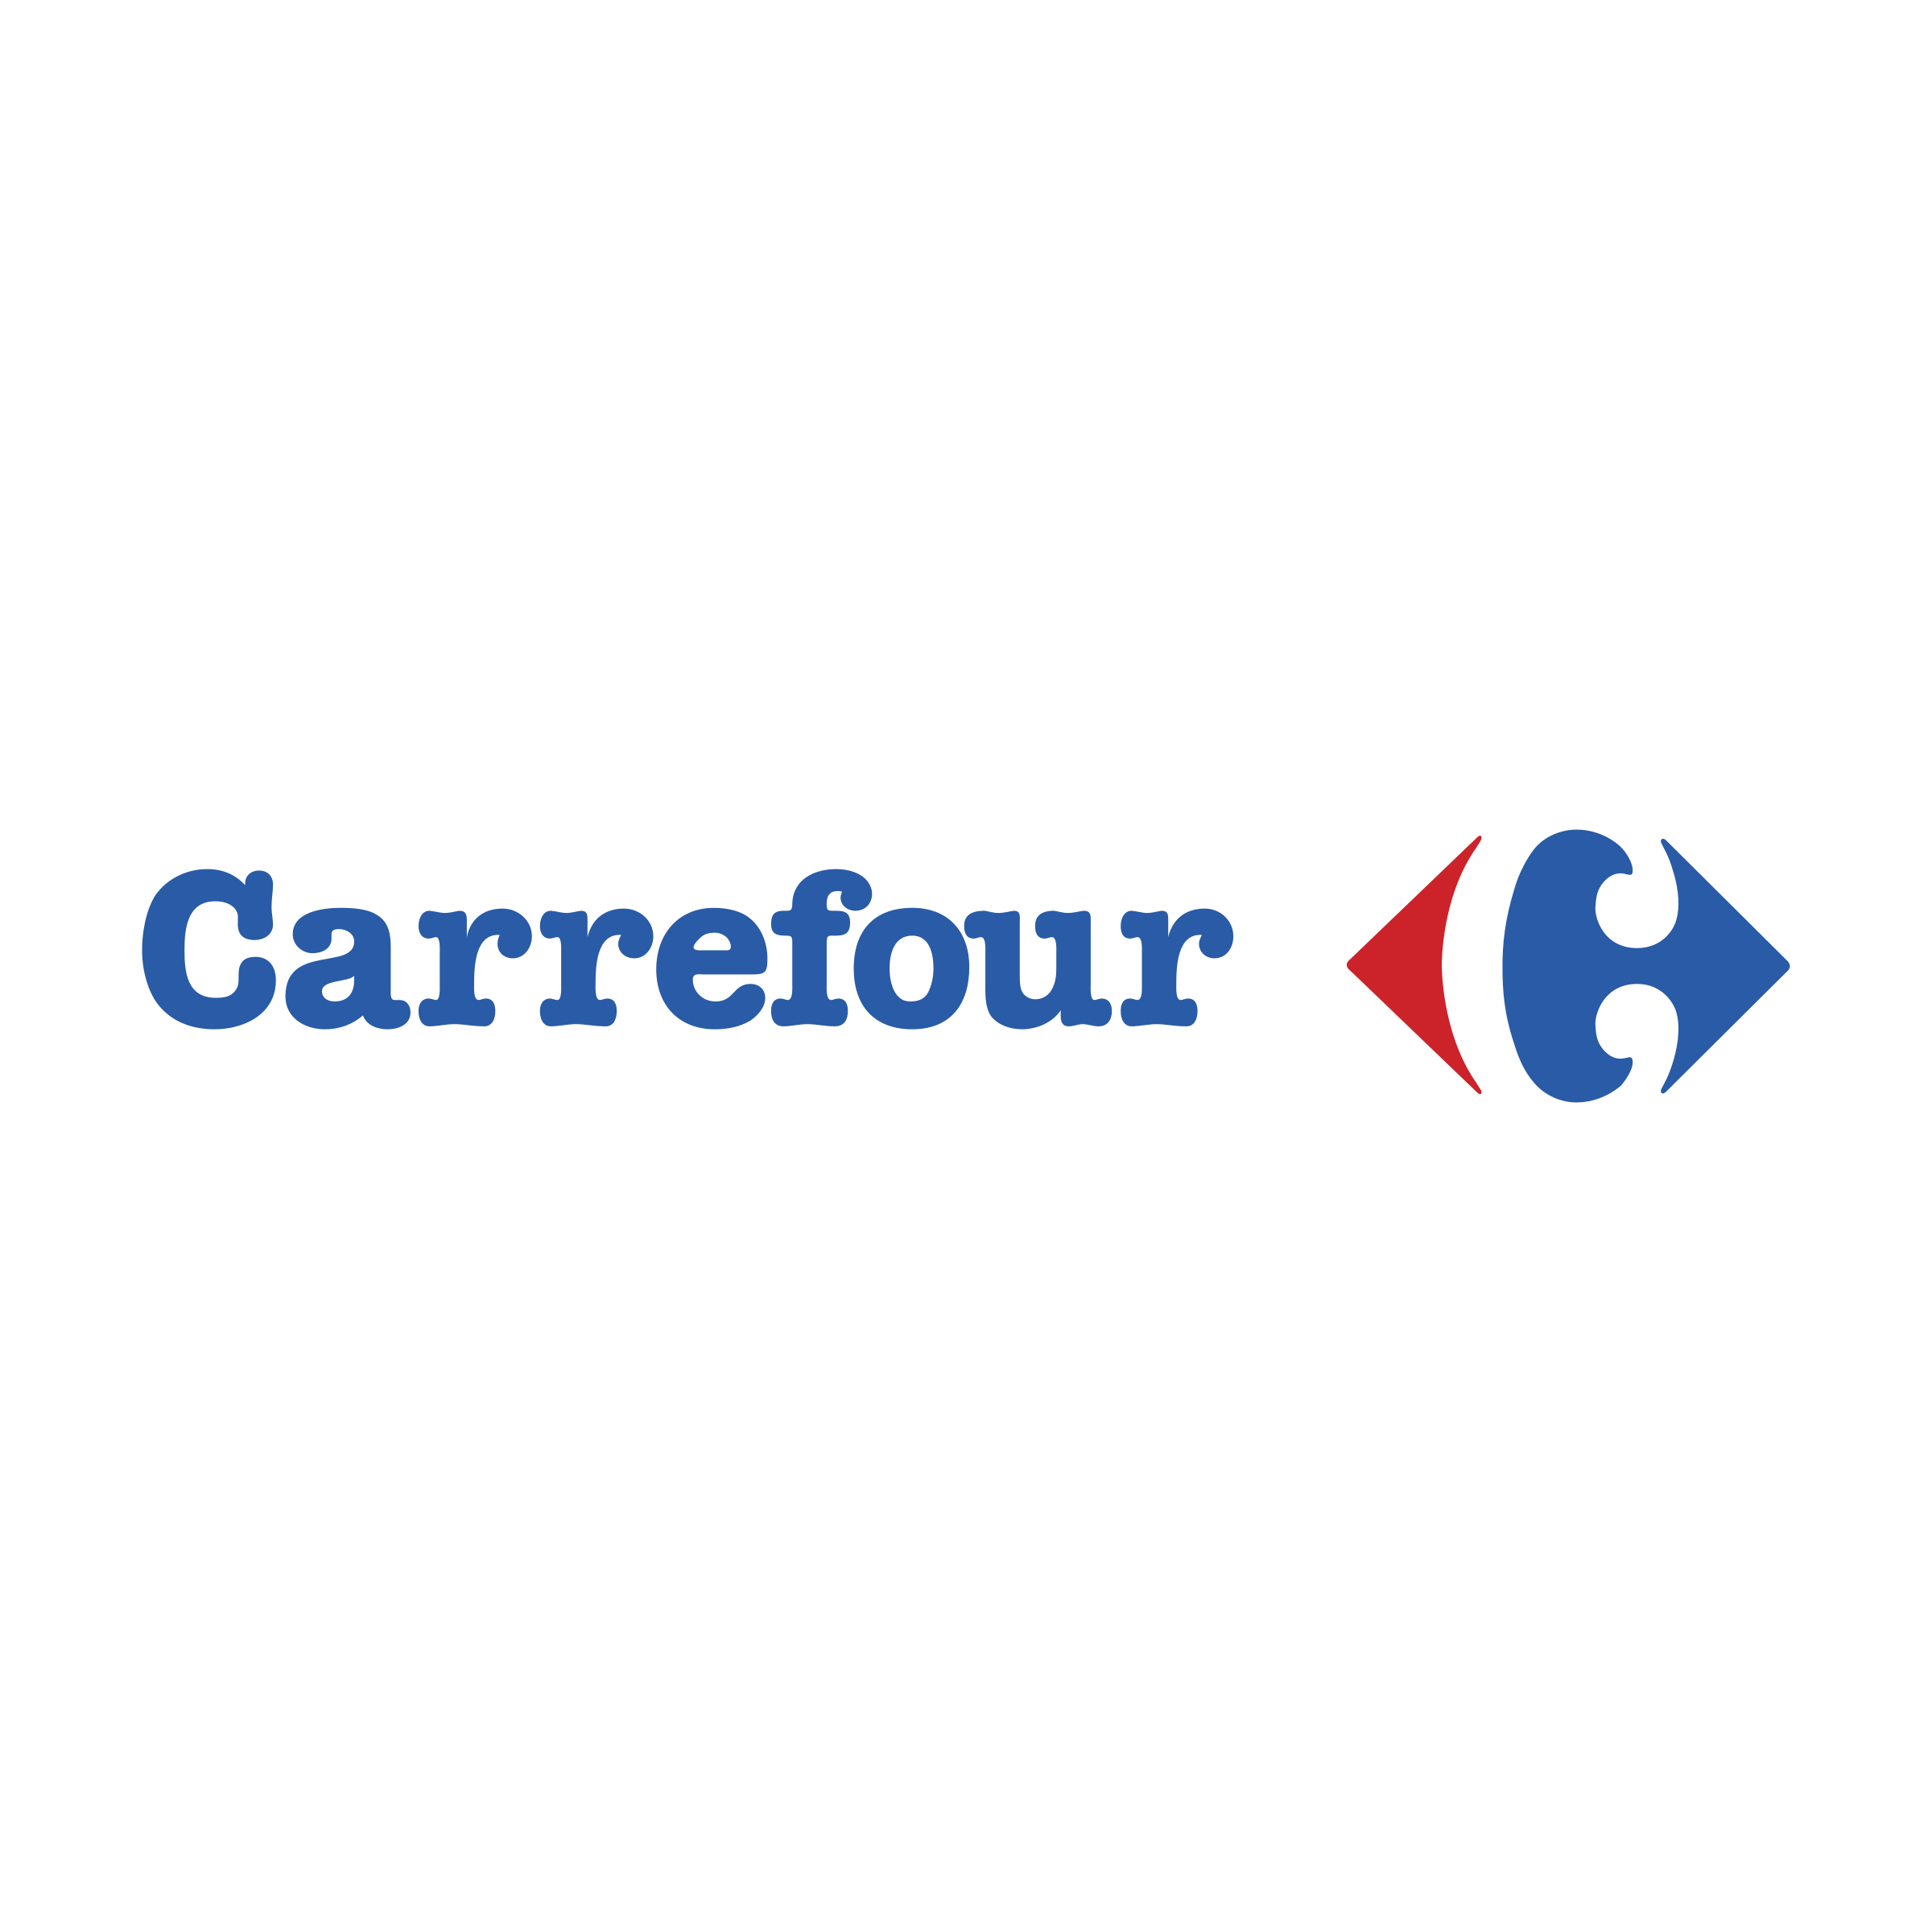 Carrefour Logo PNG Transparent & SVG Vector.